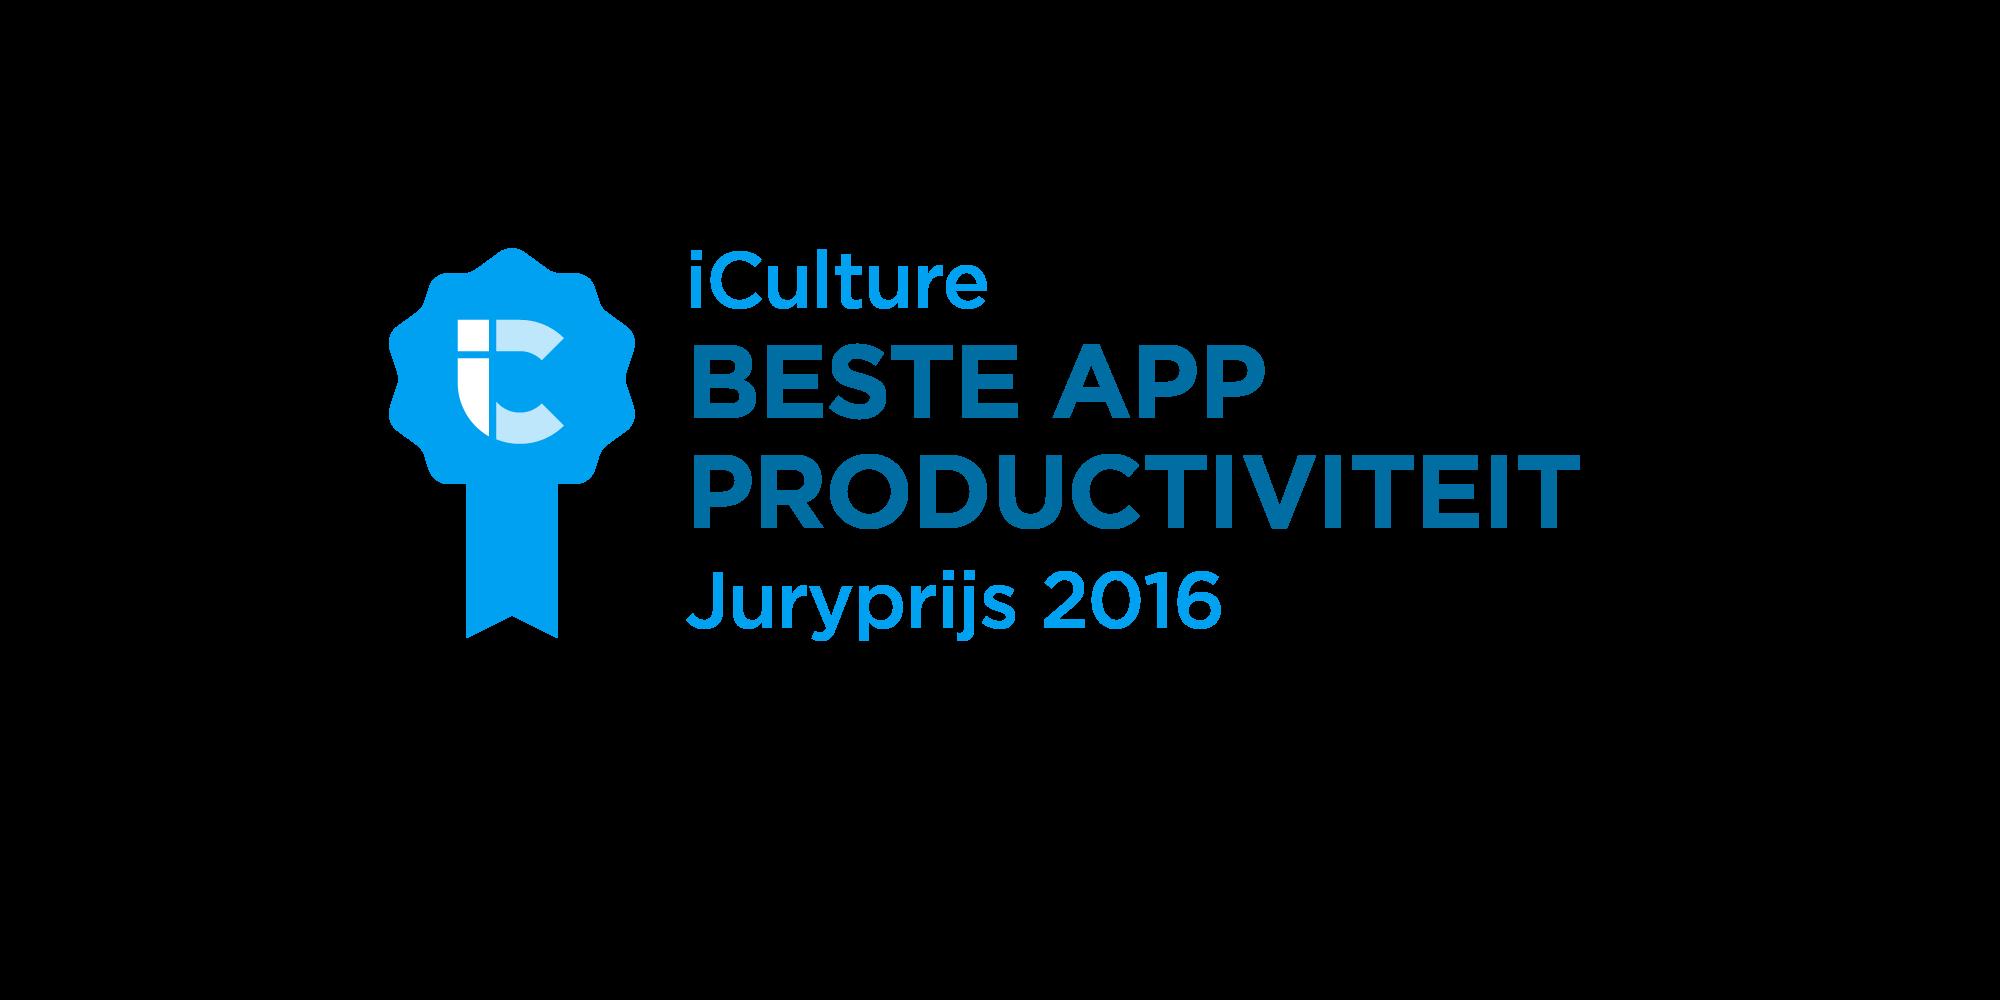 iCulture Beste App Productiviteit 2016